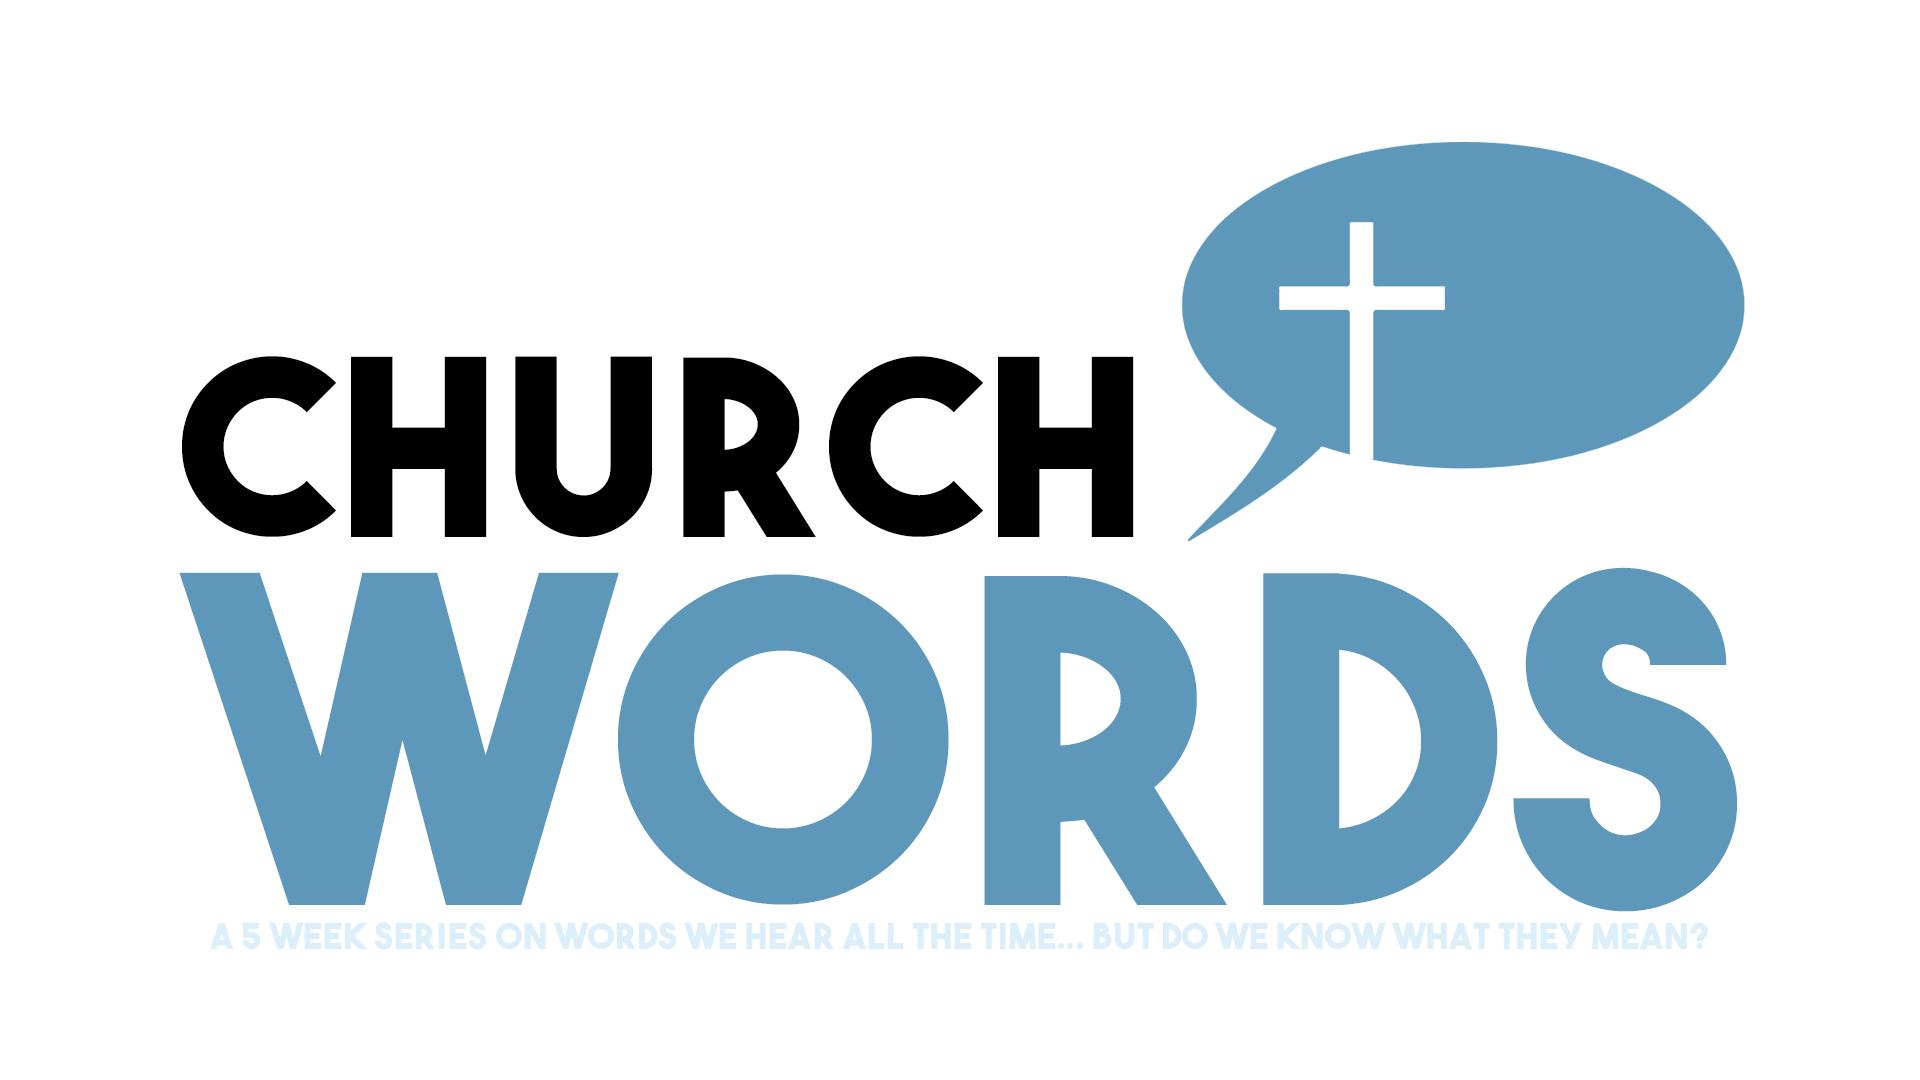 Church WOrds.jpg